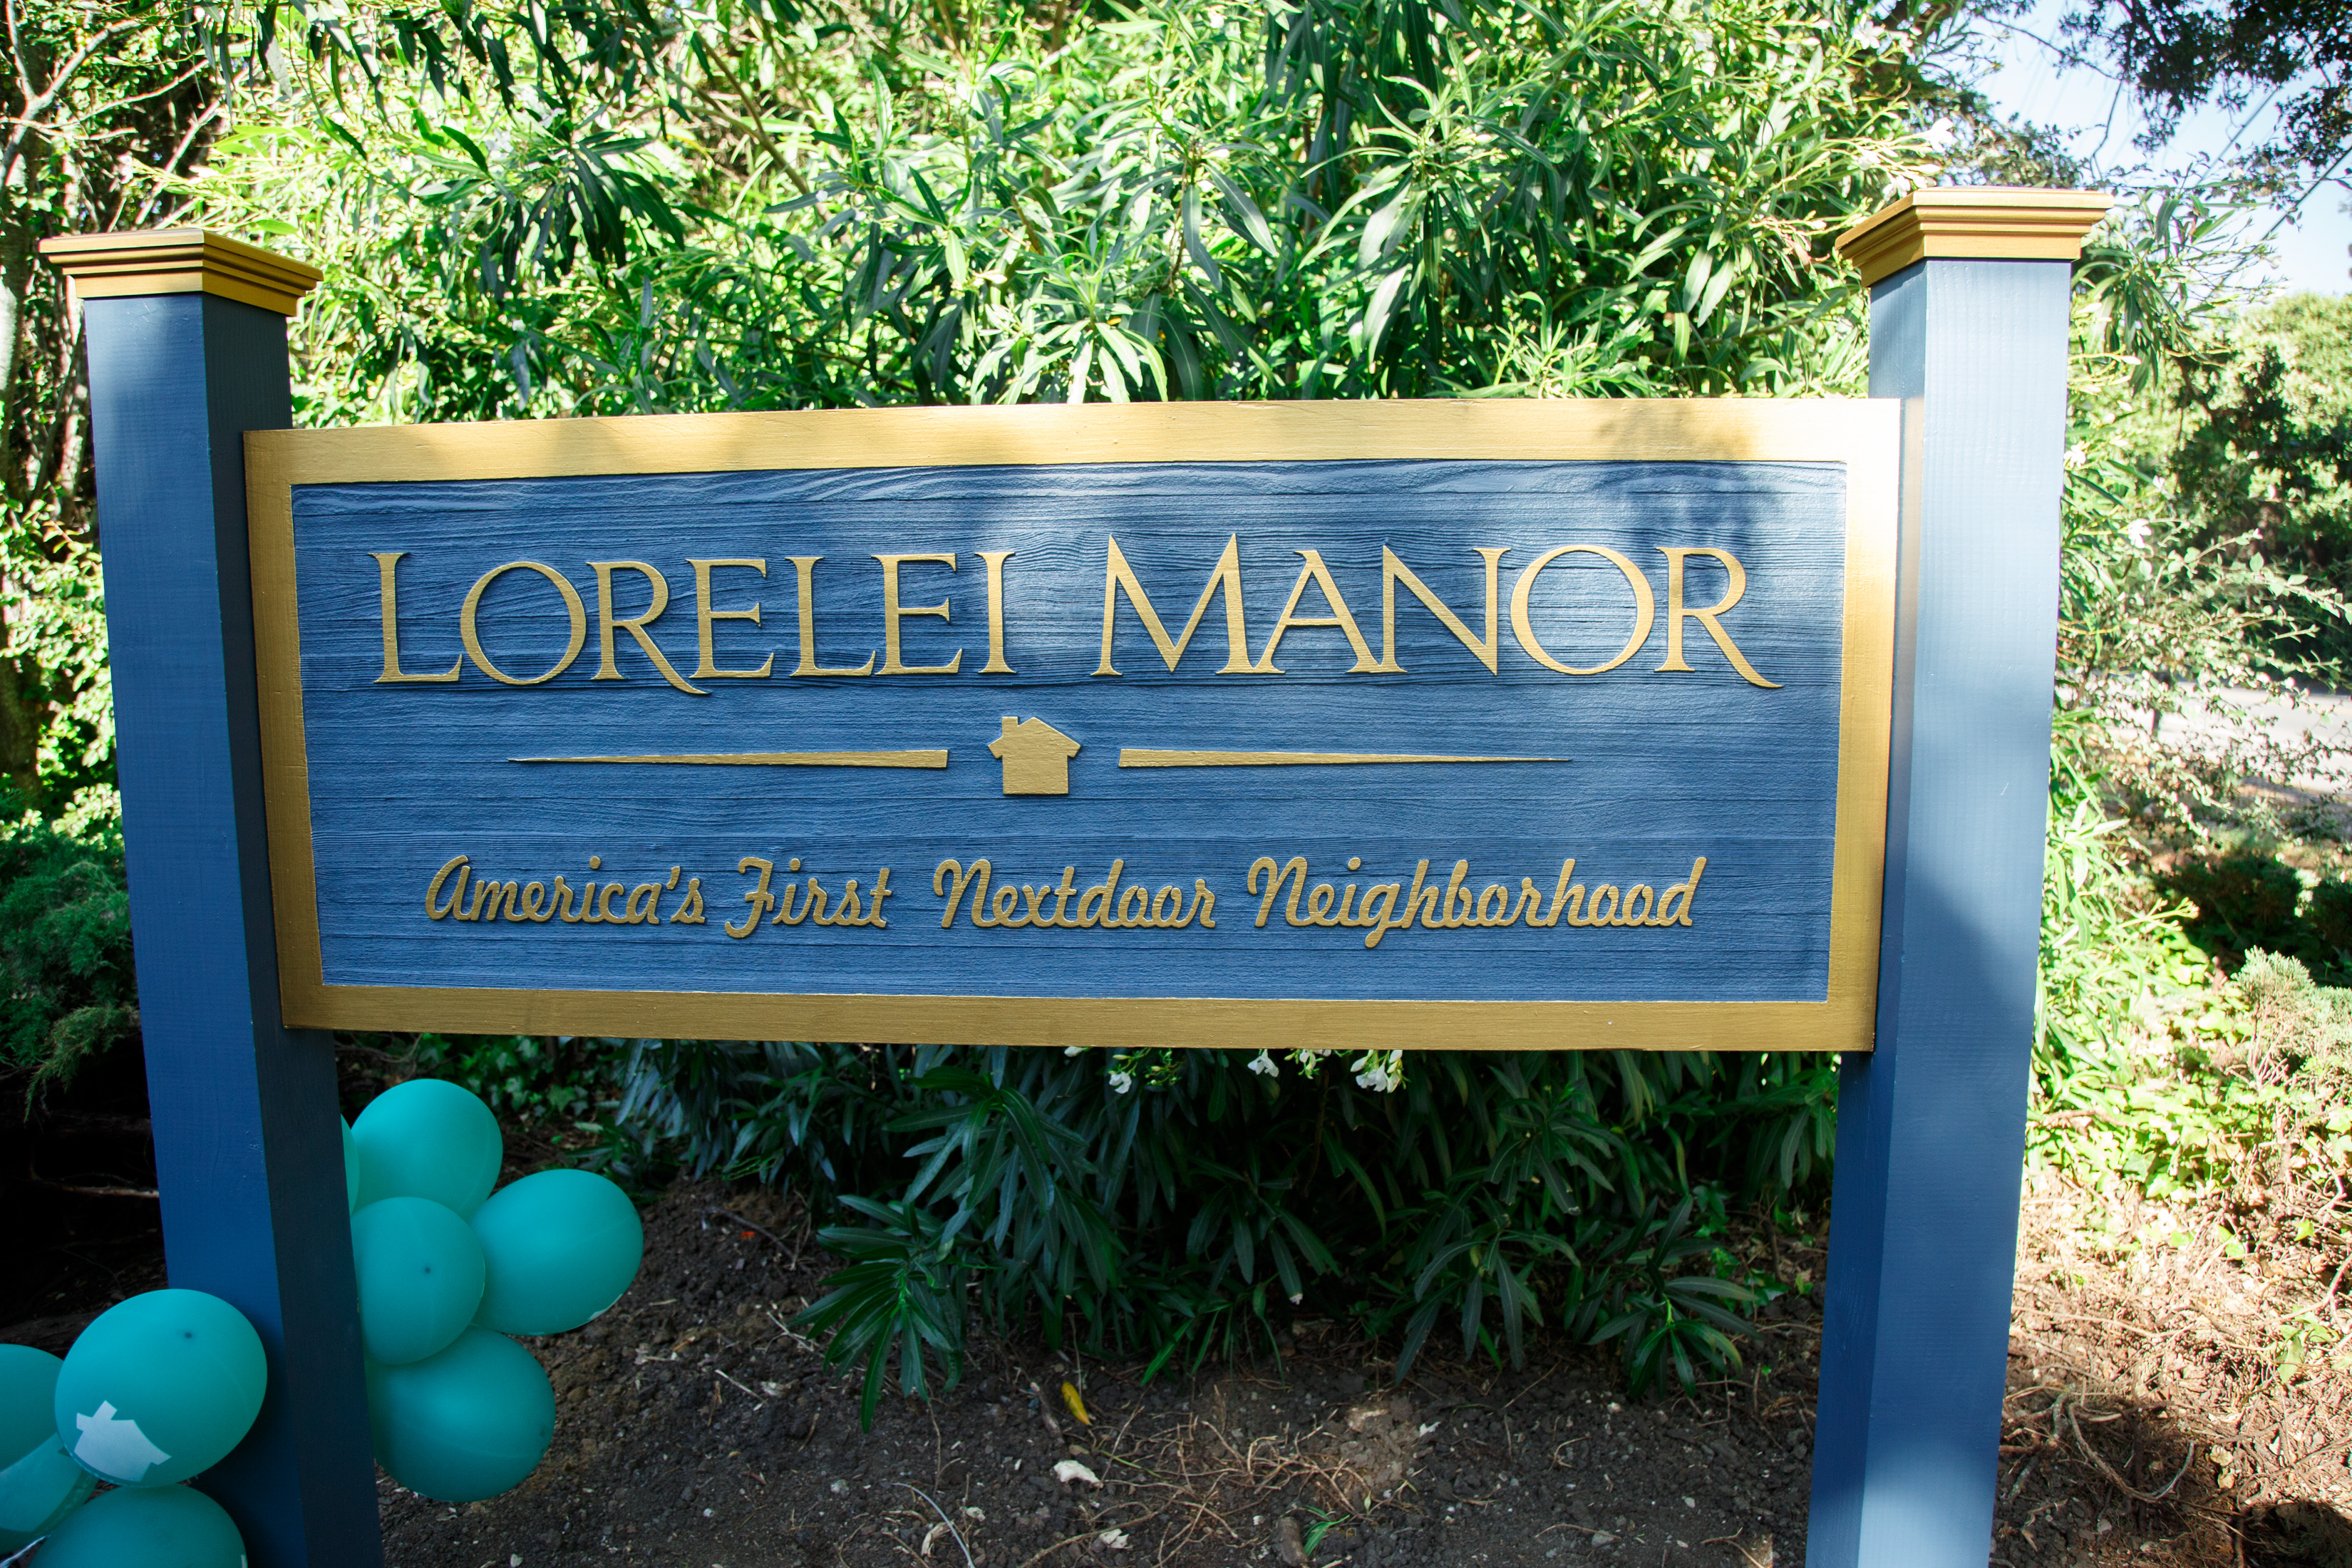 Social network Nextdoor celebrated 150,000 neighborhoods by hosting an event at its first neighborhood, Lorelei in Menlo Park, Calif.